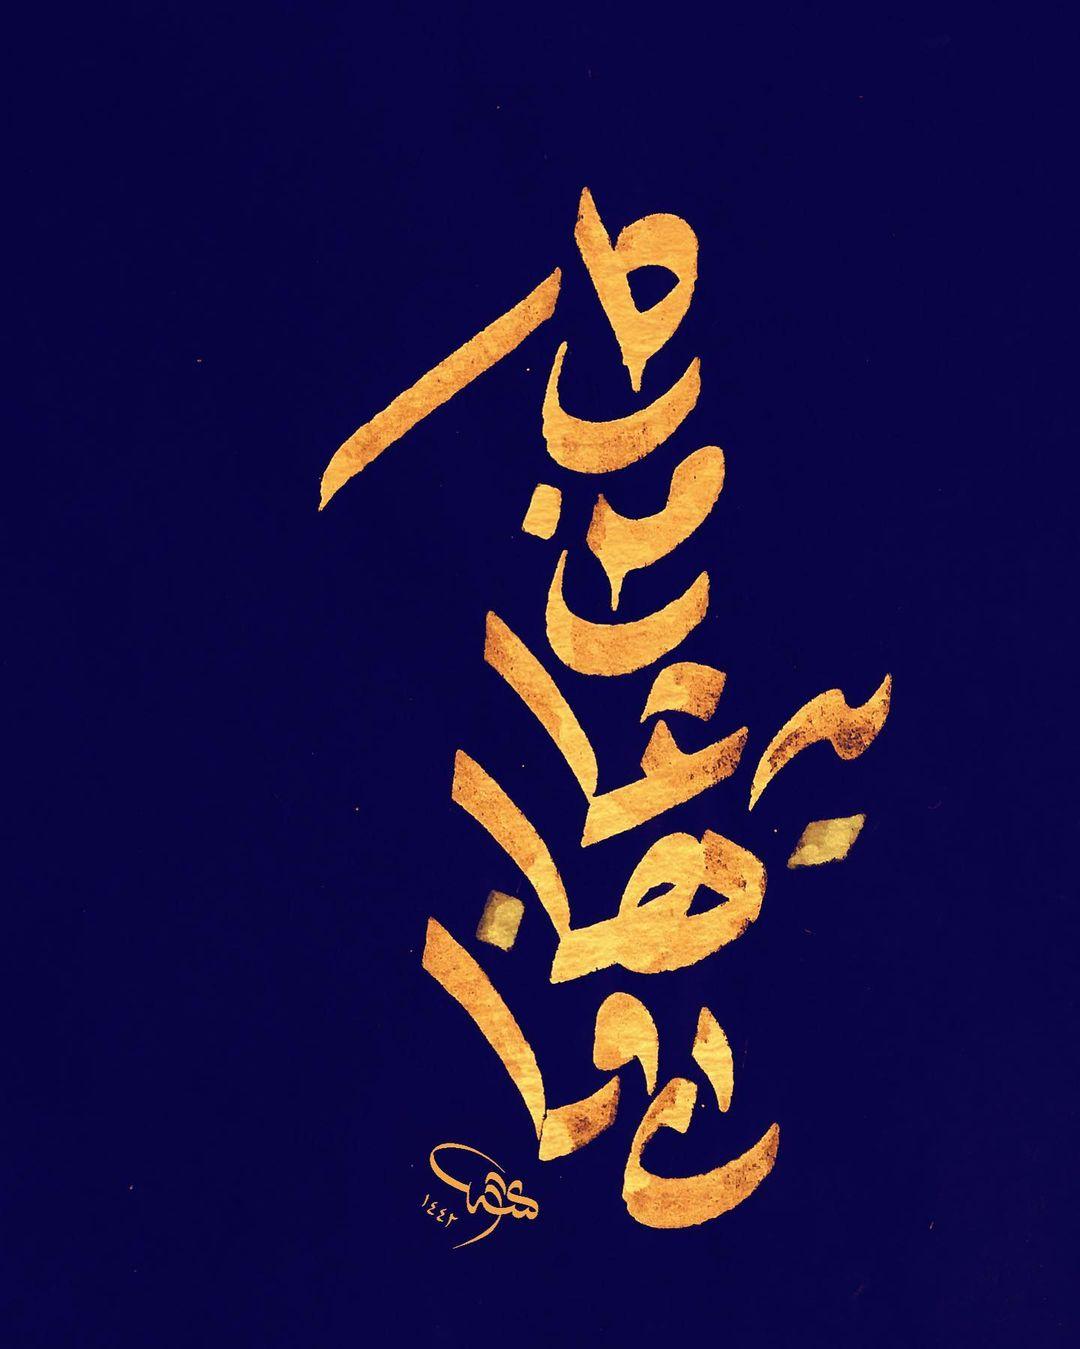 Donwload Photo كل من عليها فان Rahman 26 سورةالرحمن #arabiccalligraphy #islamiccalligraphy #tez...- hattat_aa 1